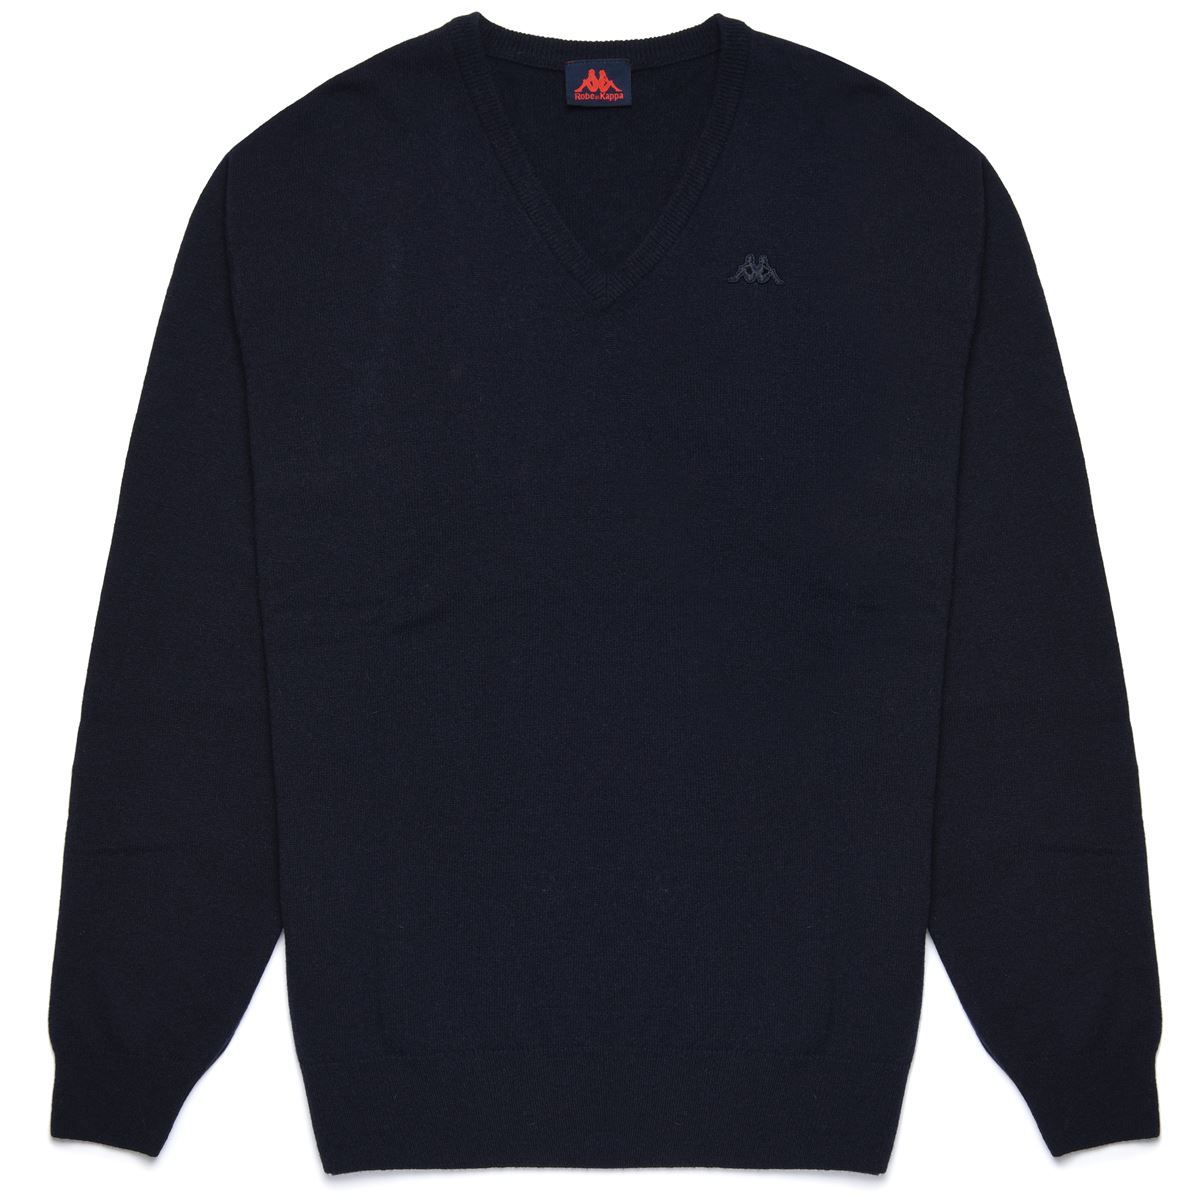 Robe di Kappa Knitwear Sweater LAMB BLEIBURG PULL OVER